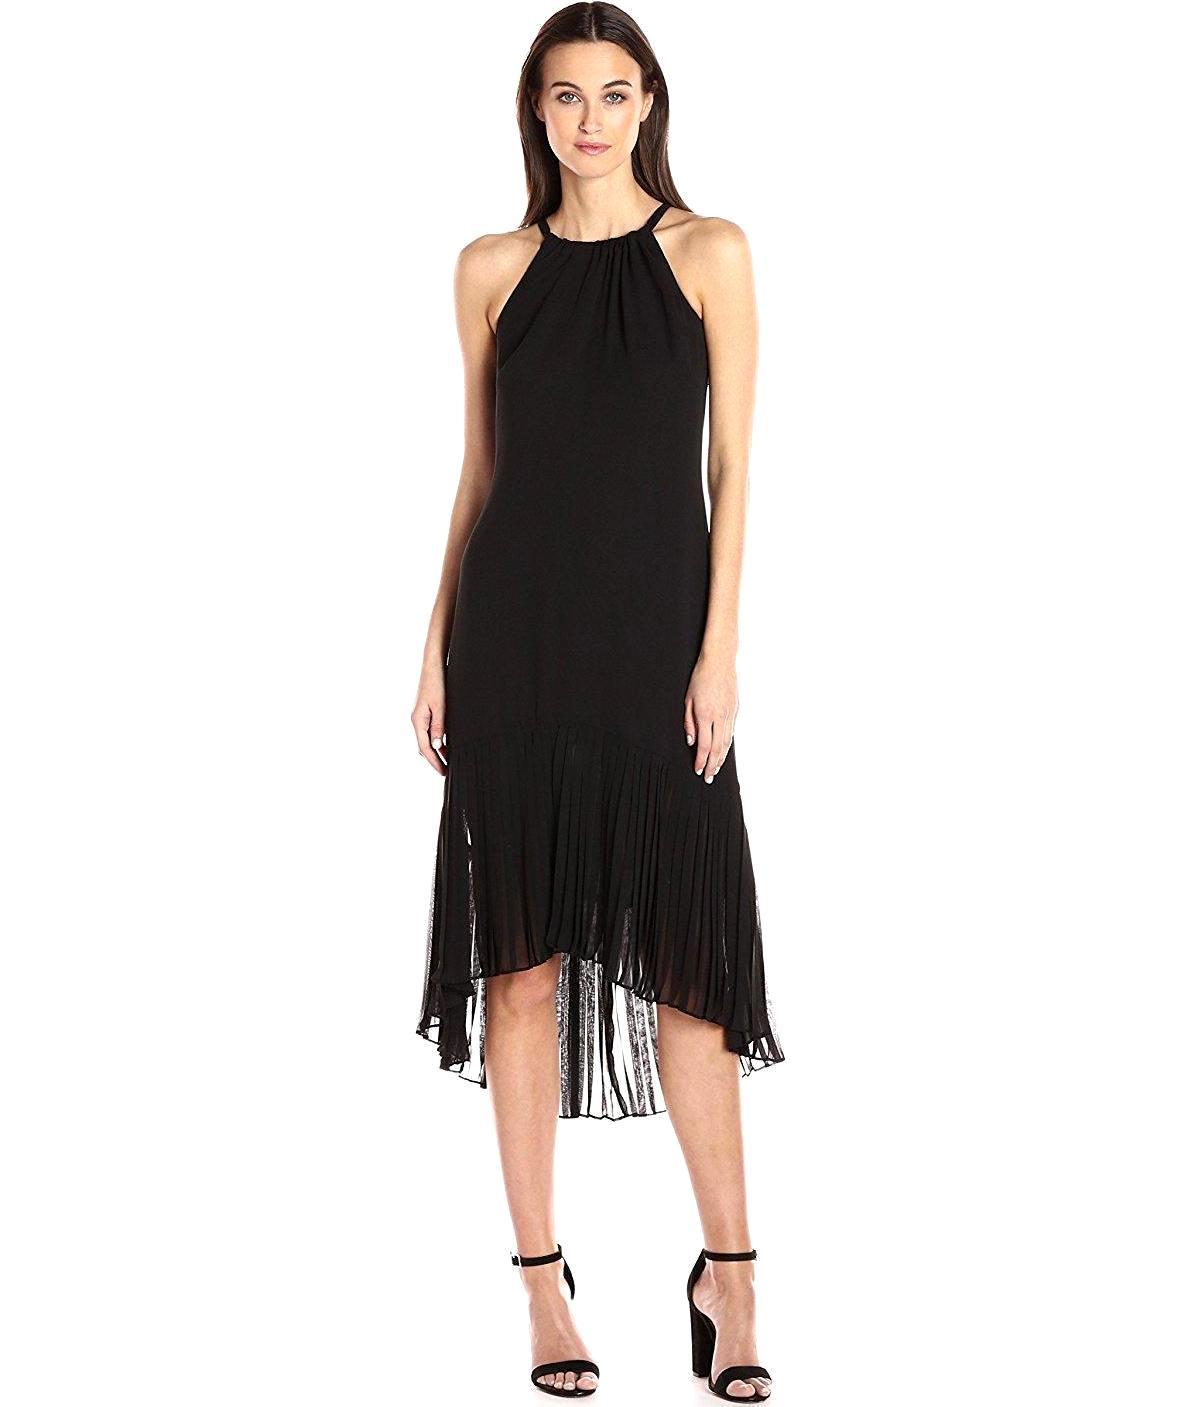 Vince Camuto Chiffon Halter Pleat Dress Black.  Vince_Camuto_Womens_Chiffon__1058_21